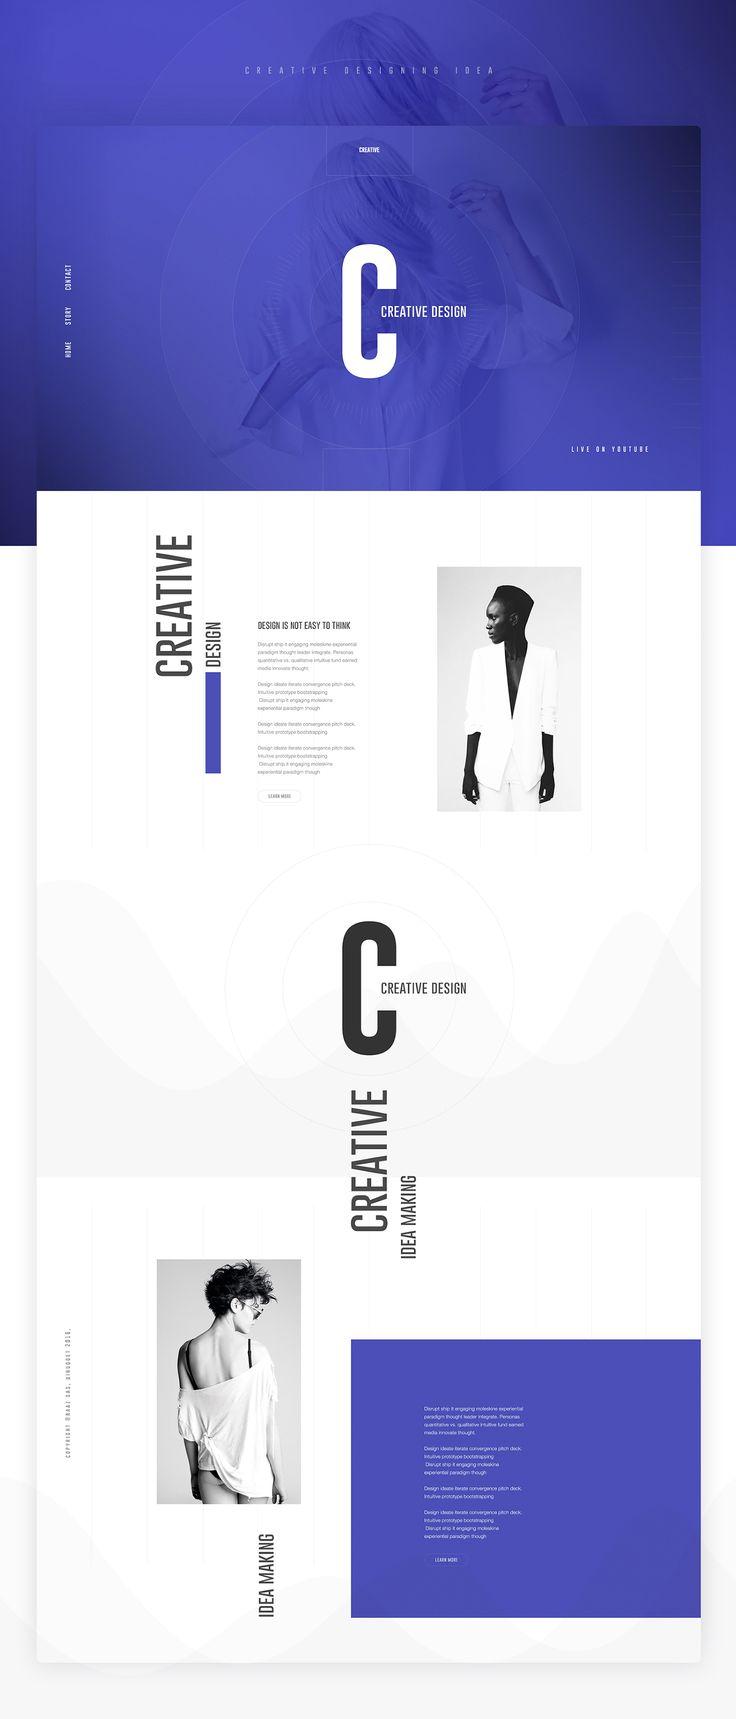 Creative Design – Ui design concept landing page by Razz Das